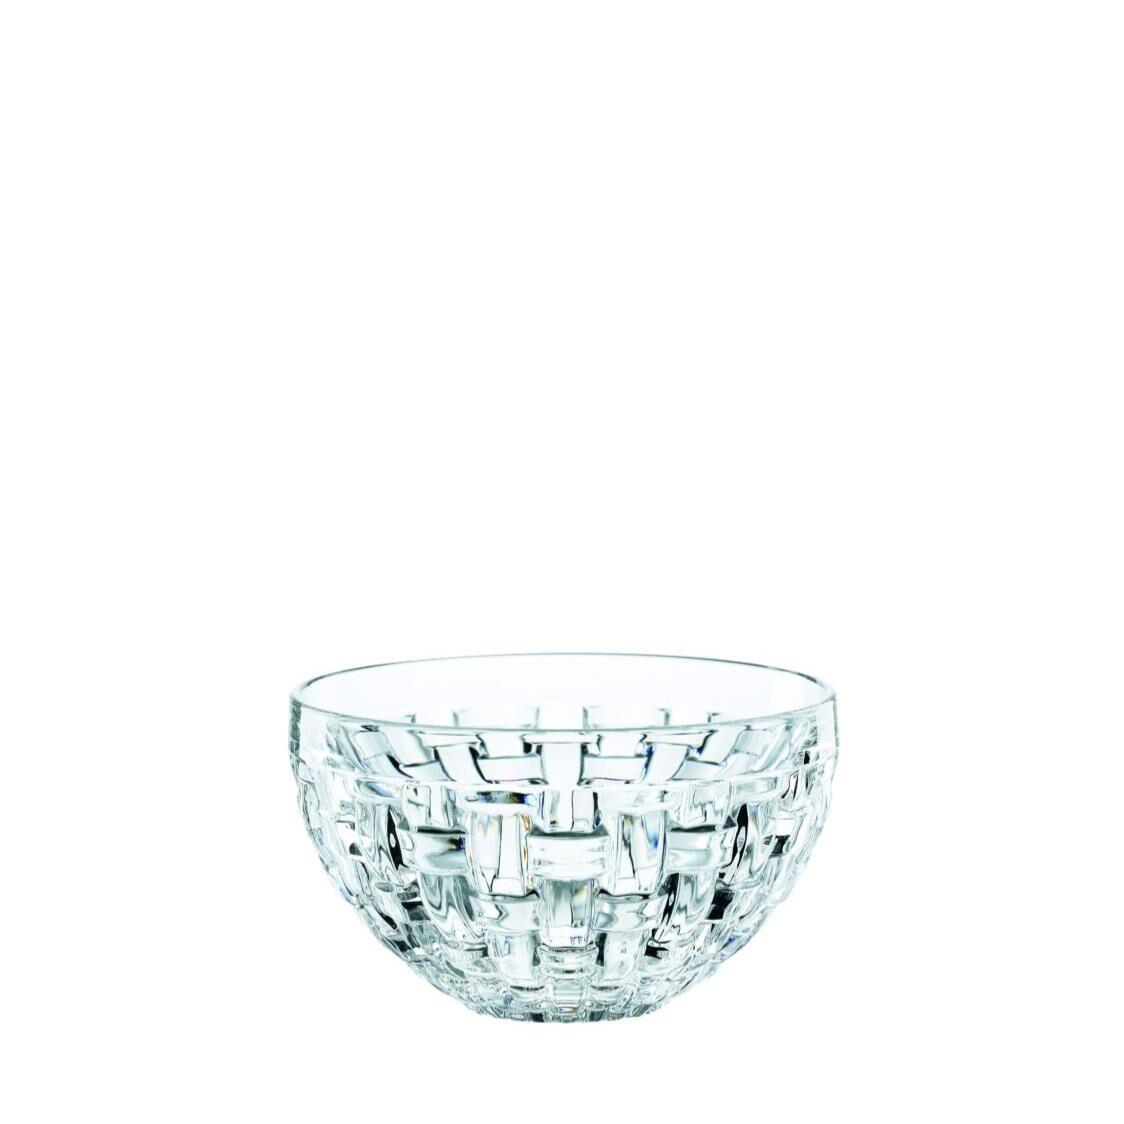 Nachtmann Lead Free Crystal Round Dip Bowl Set Of 4Pcs Bossa Nova R-101322